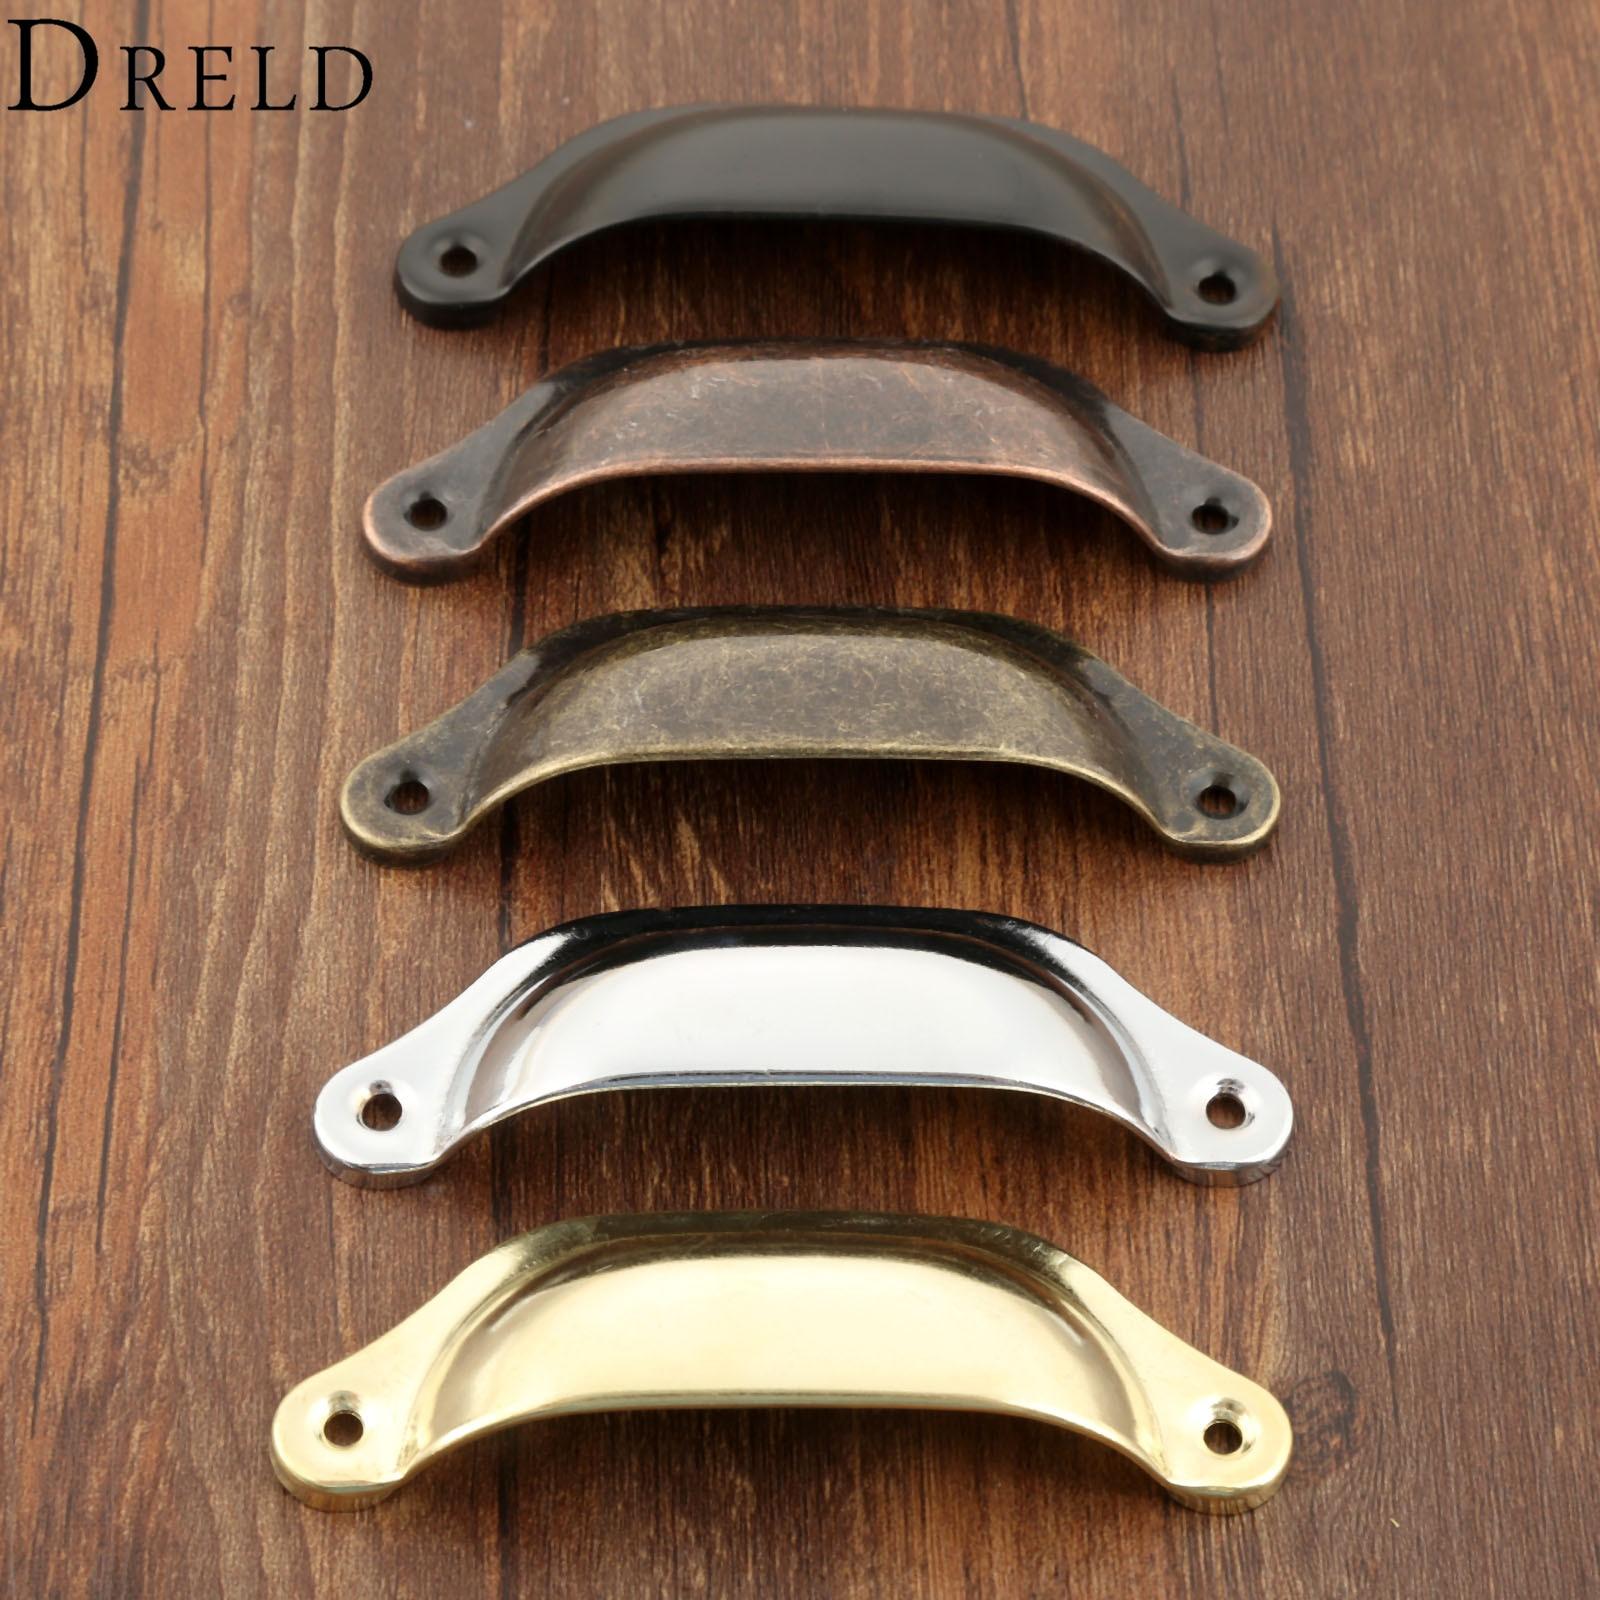 Dreld 2pcs 98 35mm Retro Kitchen Drawer Cabinet Door Handle Furniture Knobs Hardware Cupboard Antique Brass Shell Pull Handles